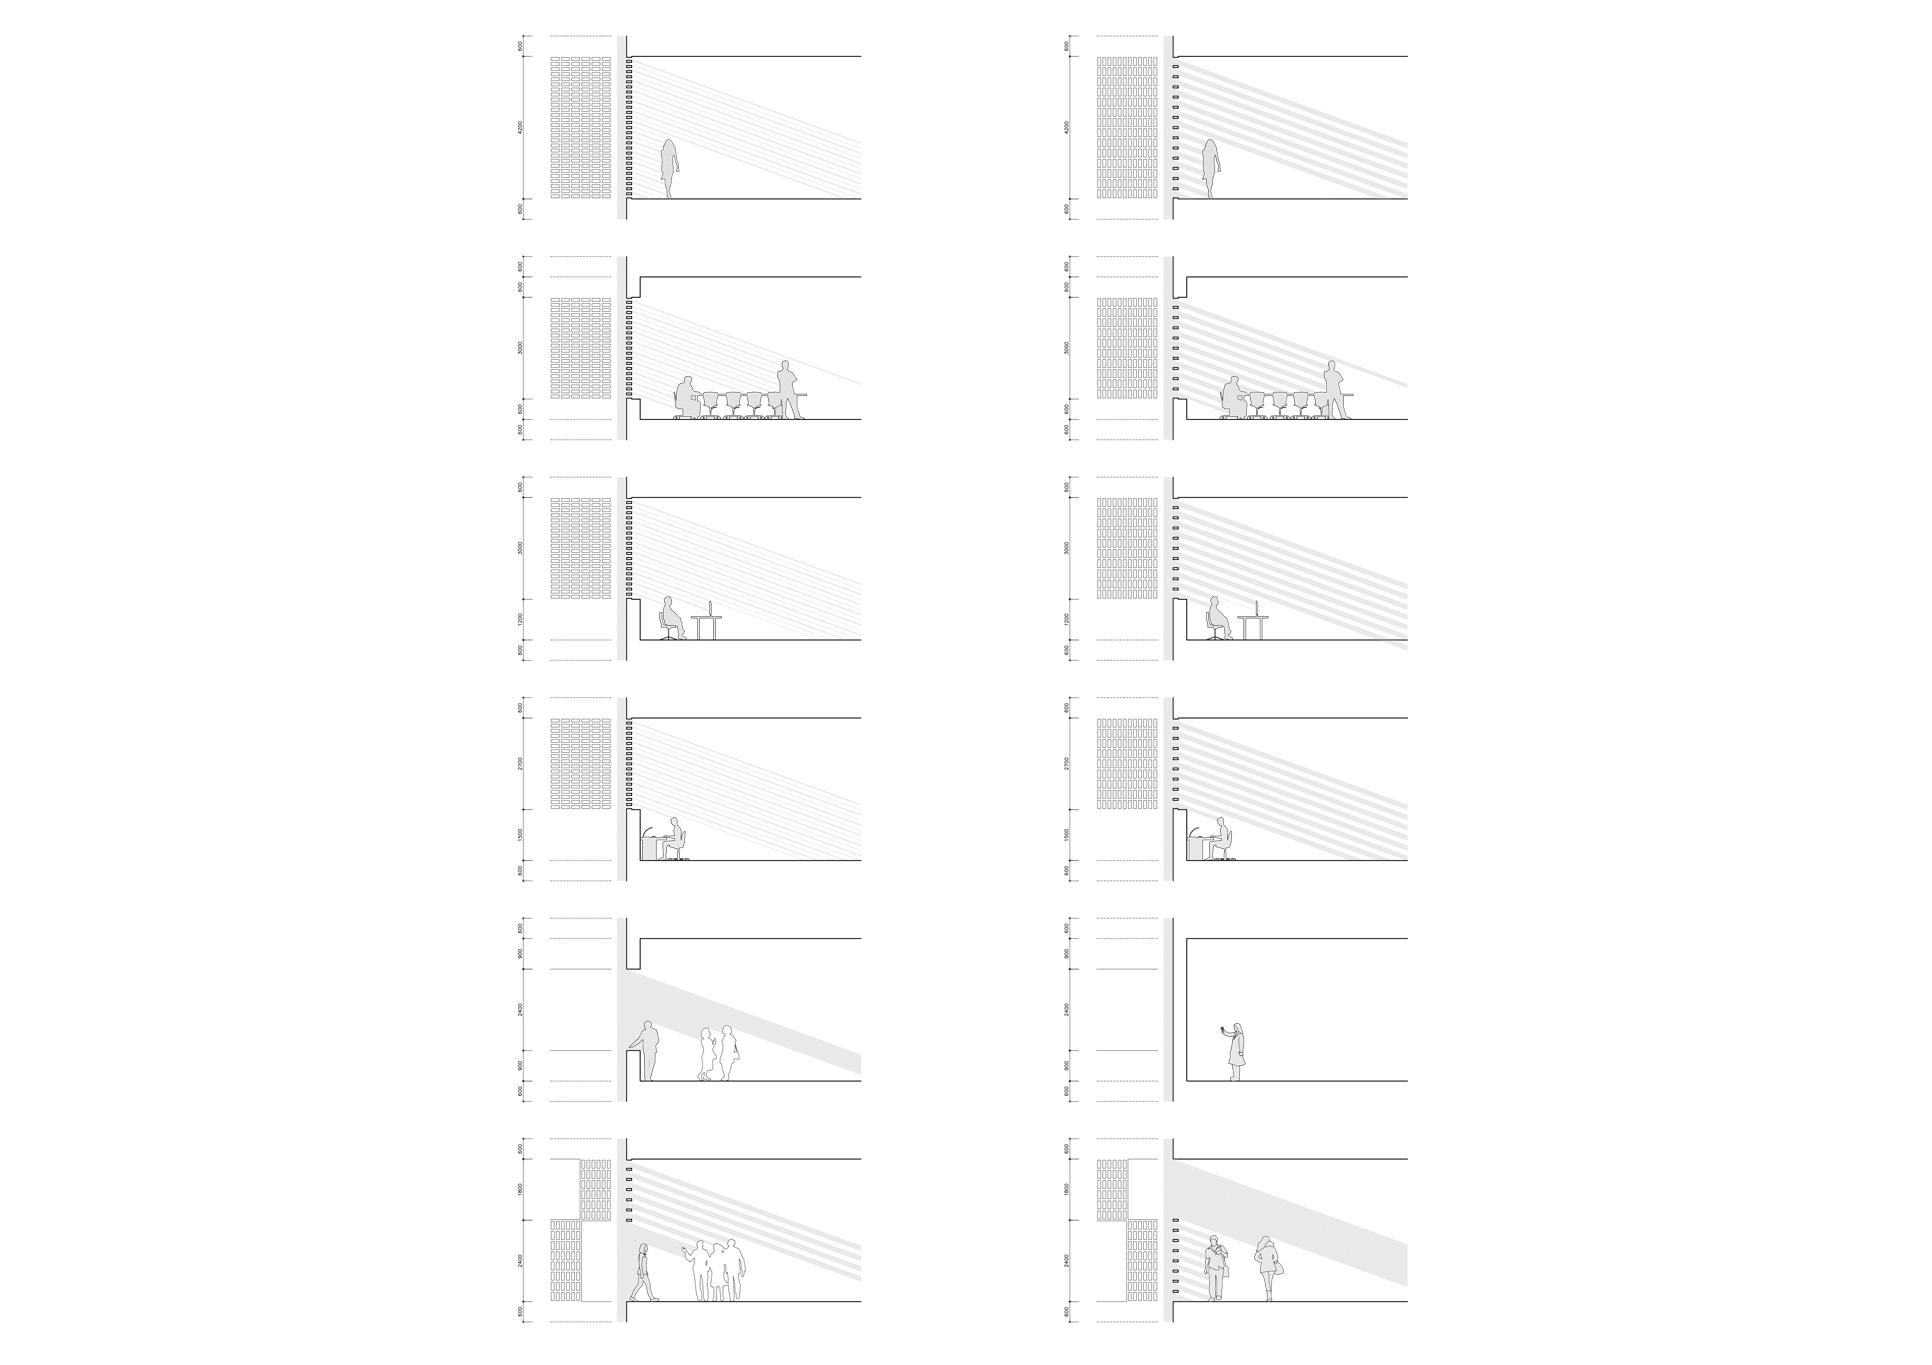 skin sectional diagrams.jpg